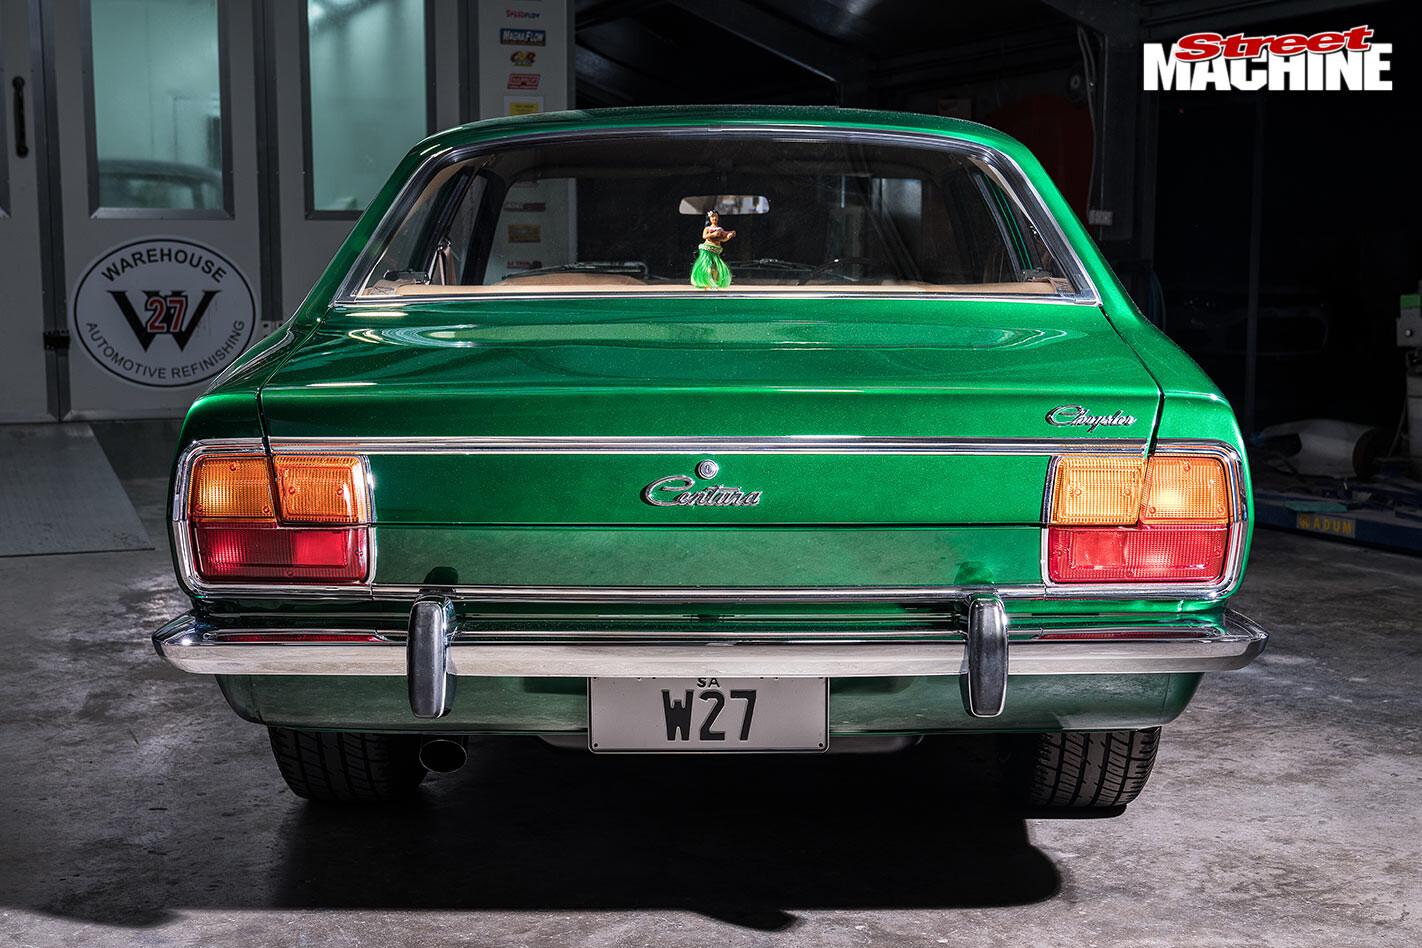 Chrysler Centura rear